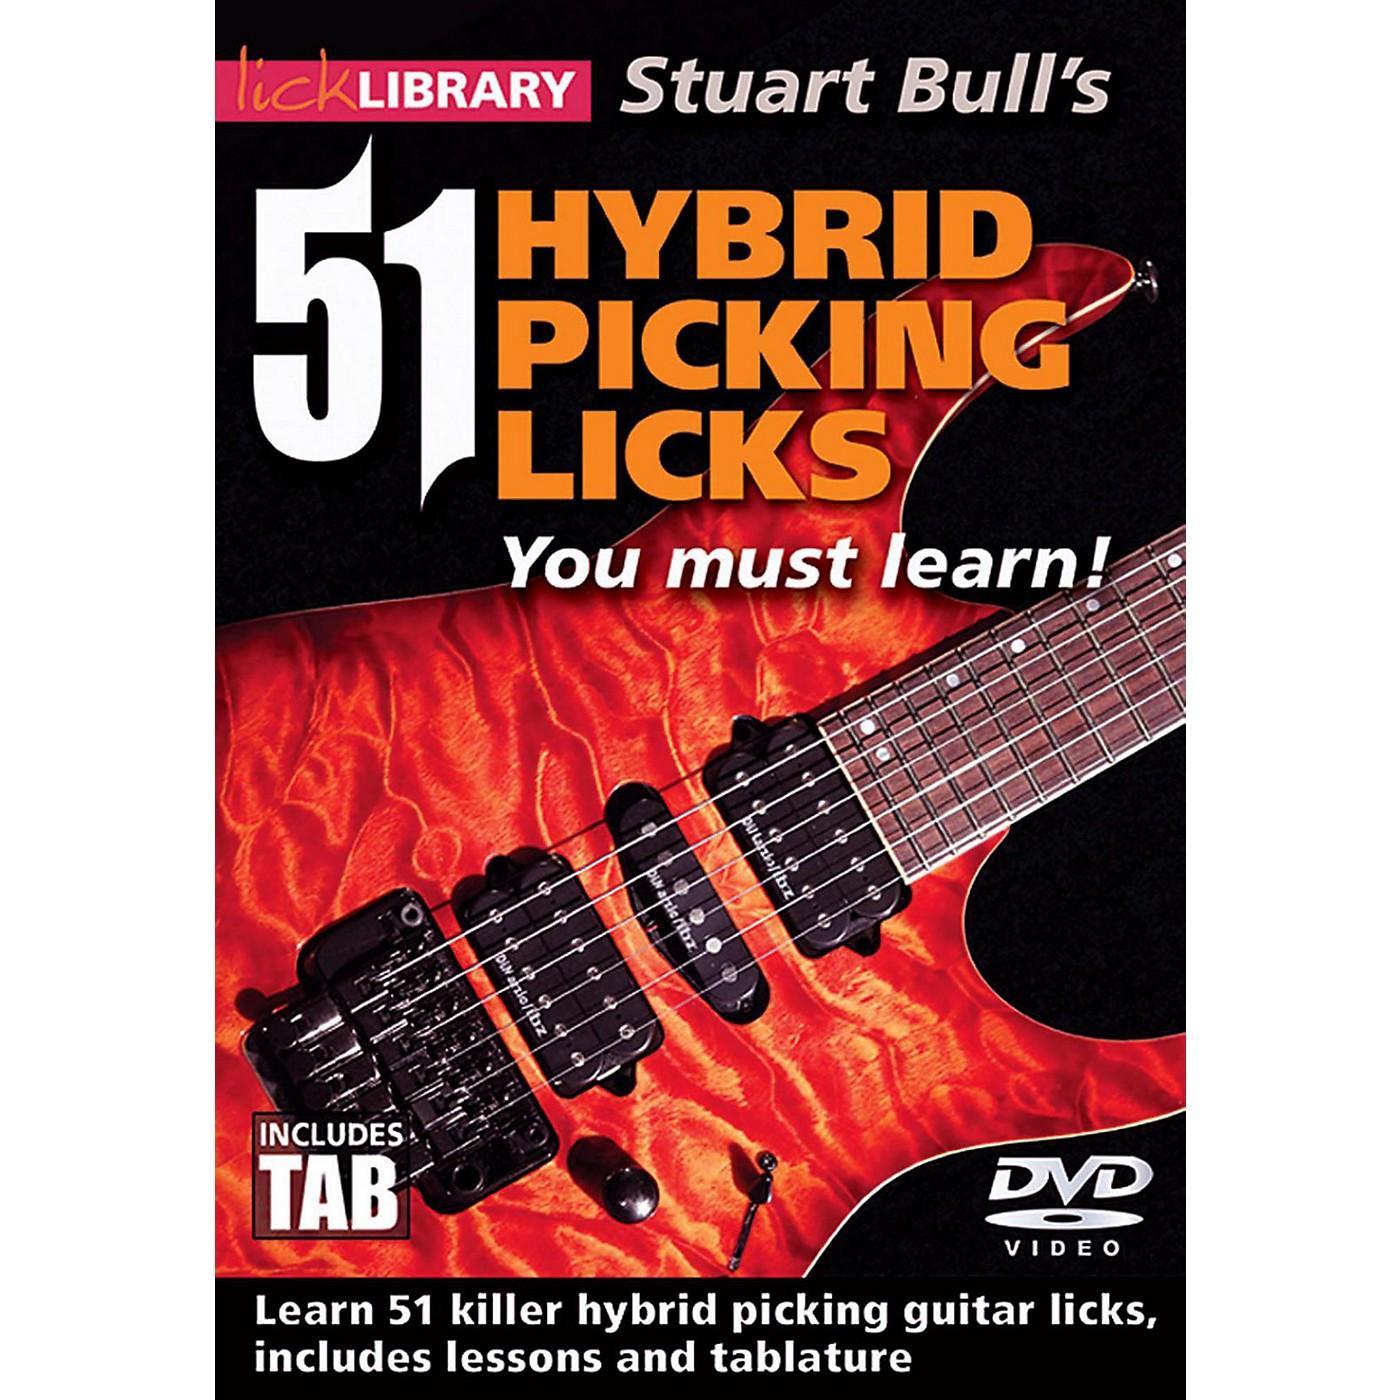 Hal Leonard 51 Hybrid Picking Licks You Must Learn - Lick Library DVD thumbnail